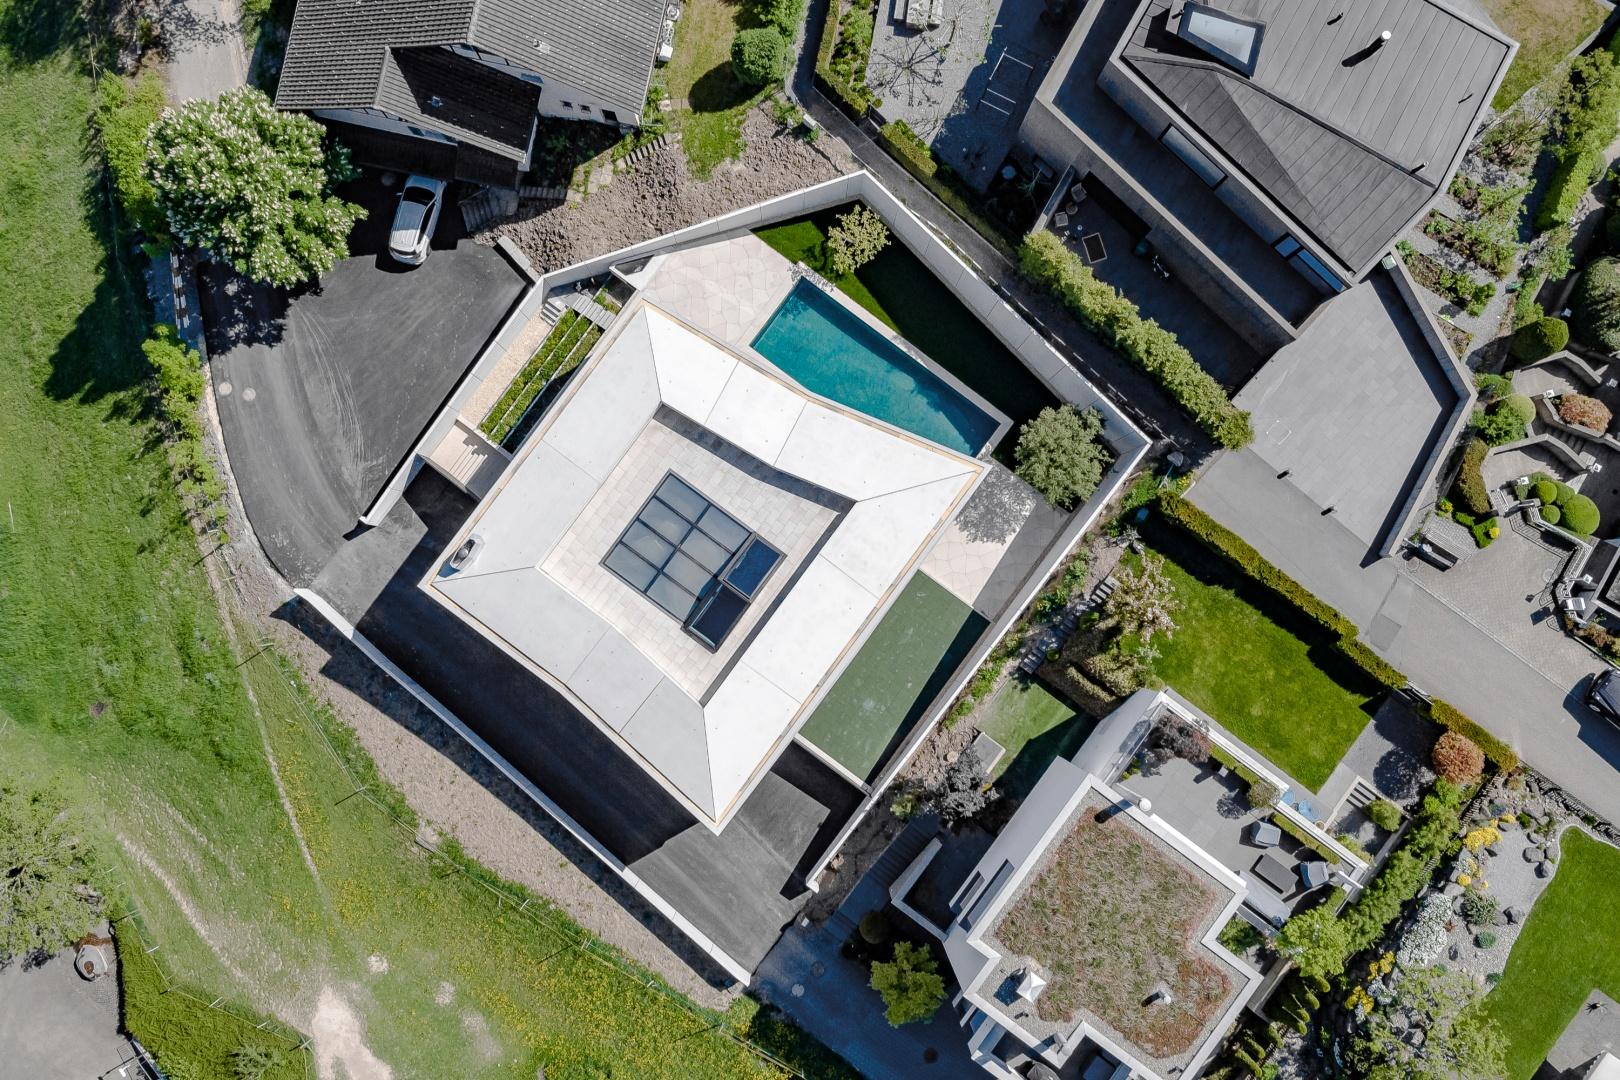 Luftaufnahme © Mark Drotsky, Langenthal